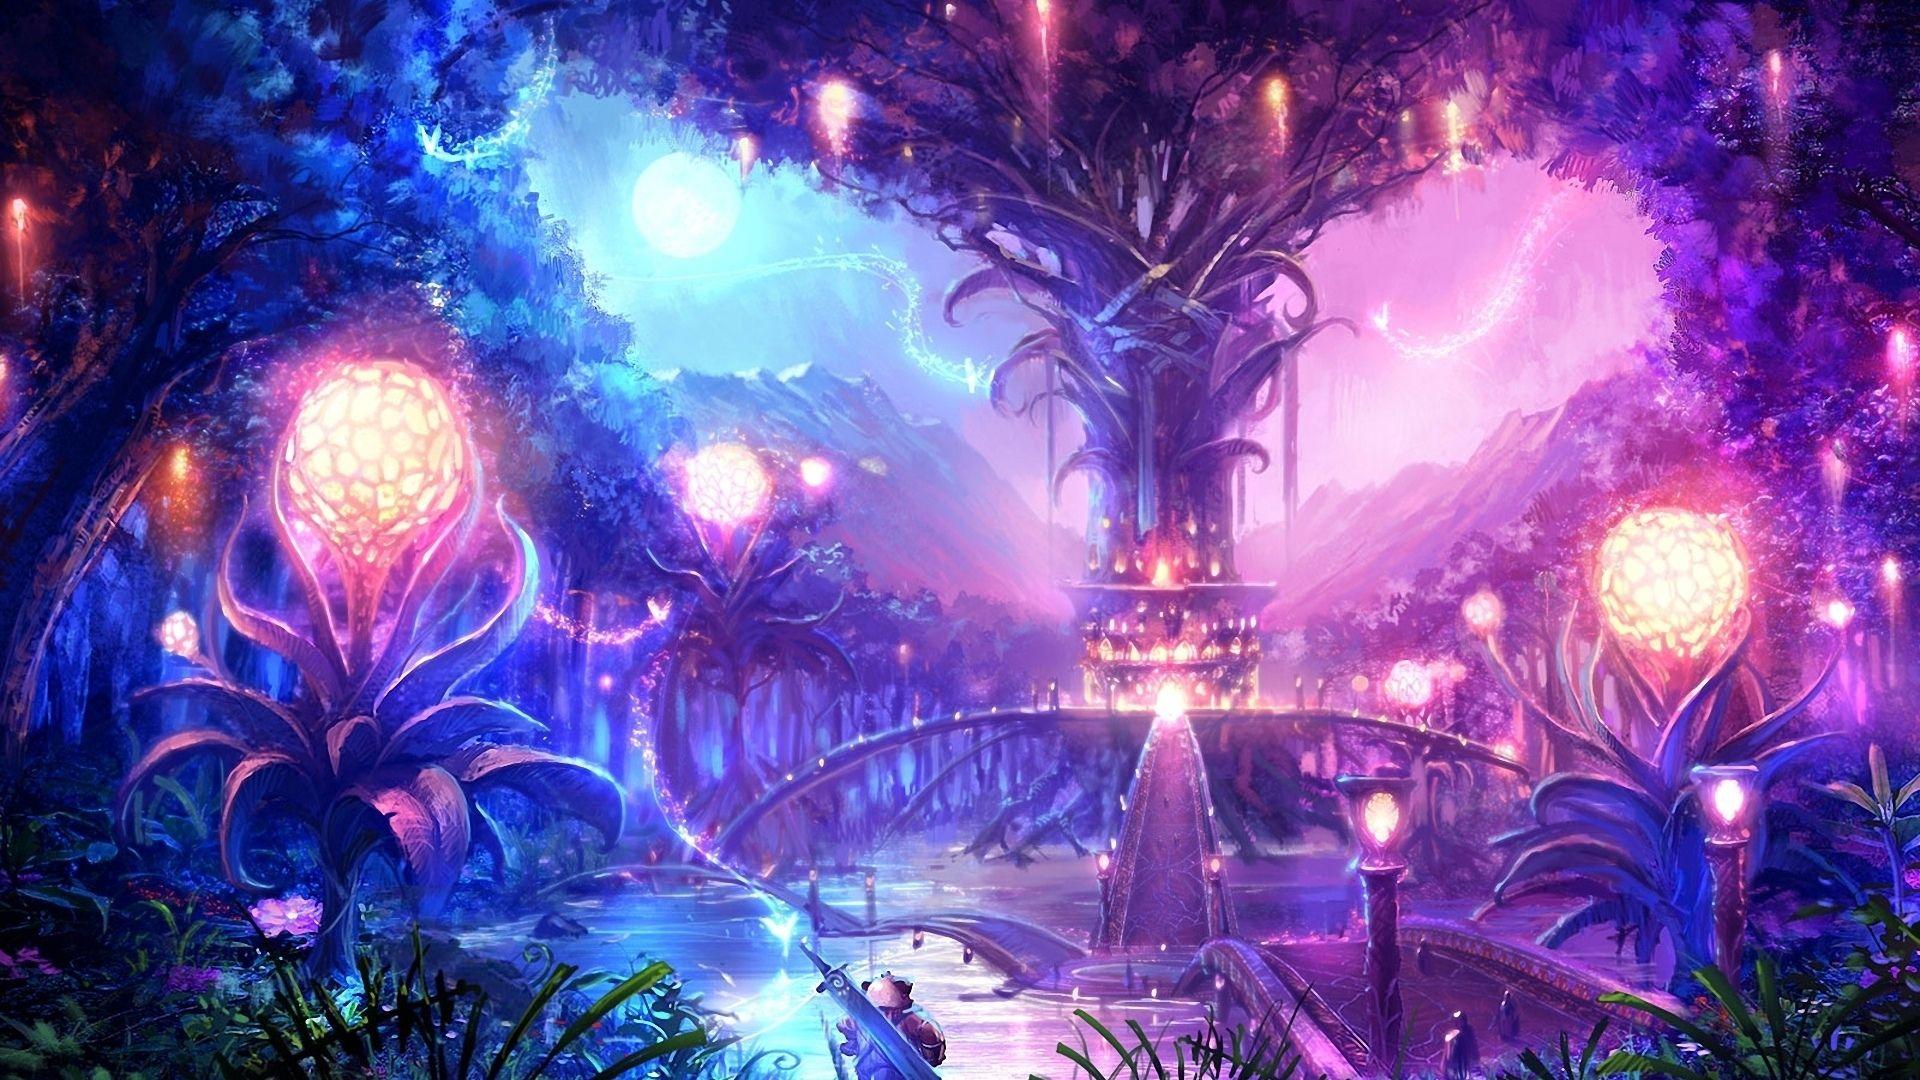 Anime Fantasy Landscape Wallpaper High Definition Pejzazhi Kartiny Pejzazha Oboi Iskusstvo